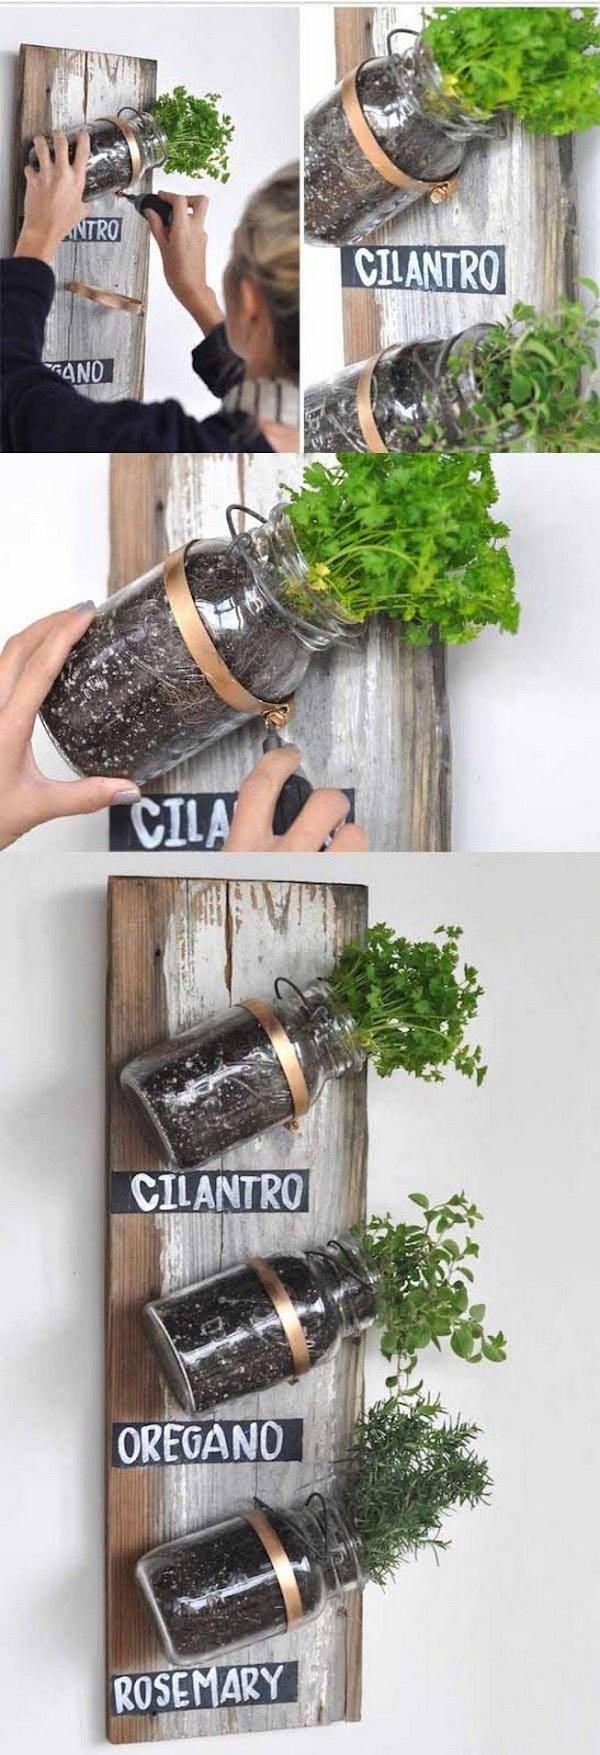 13 DIY Mason Jar Herb Garden